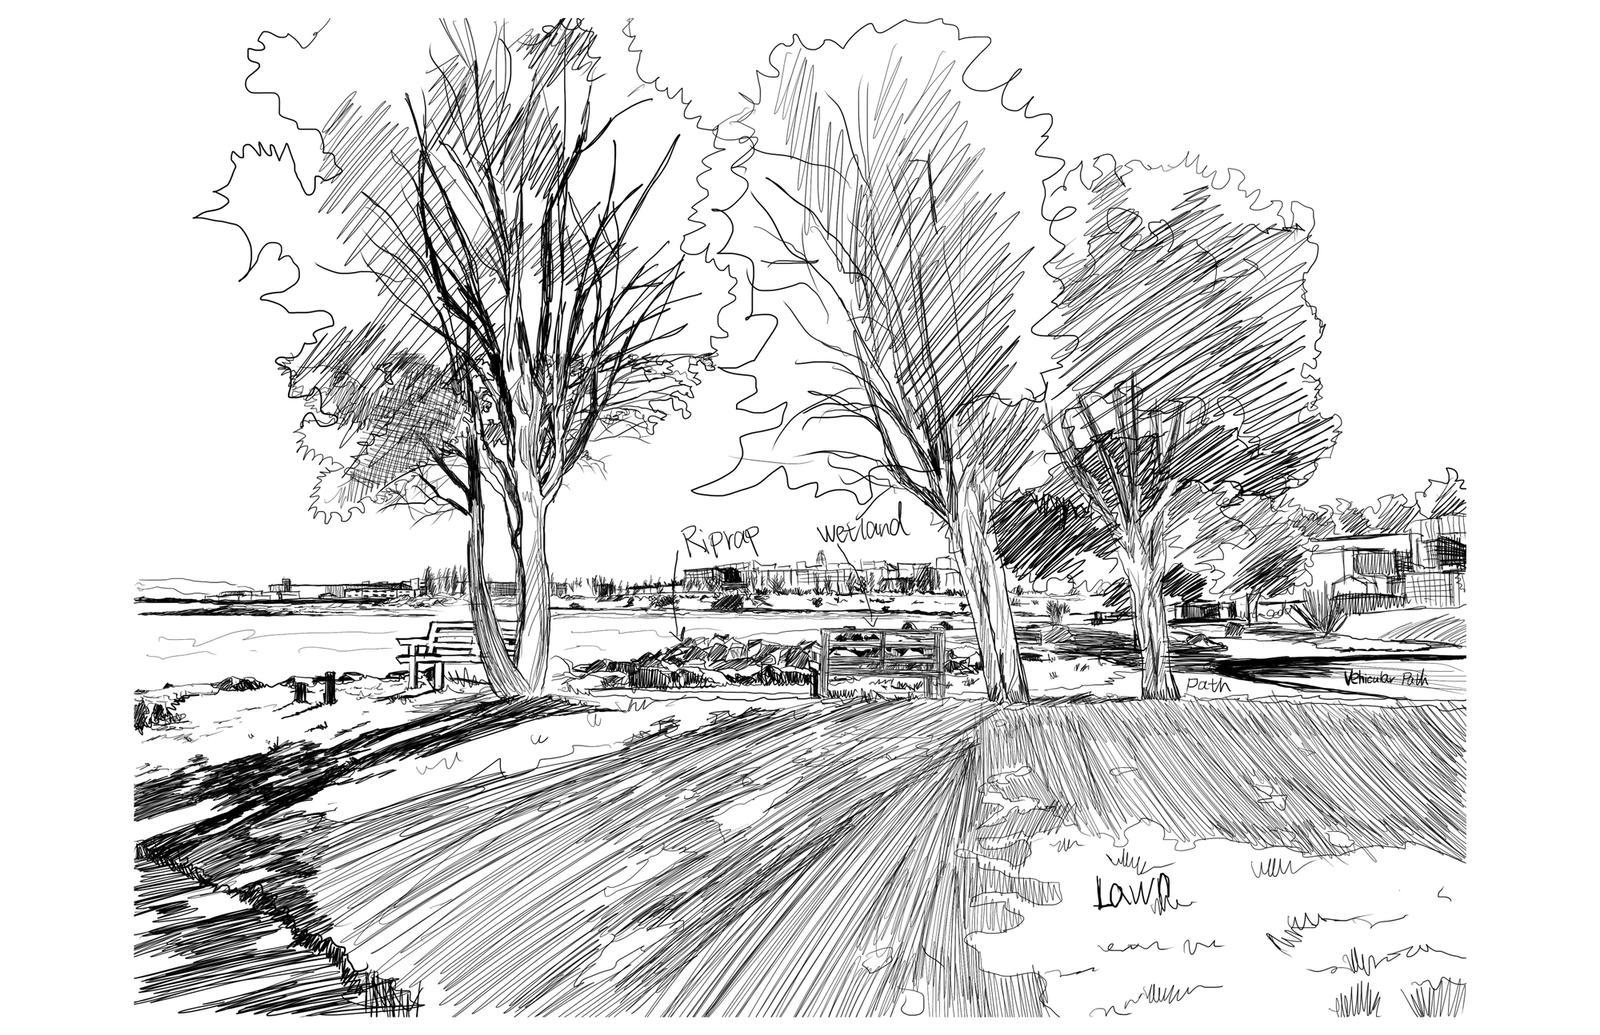 Site Analysis Sketch 1 – India Basin Park, San Francisco